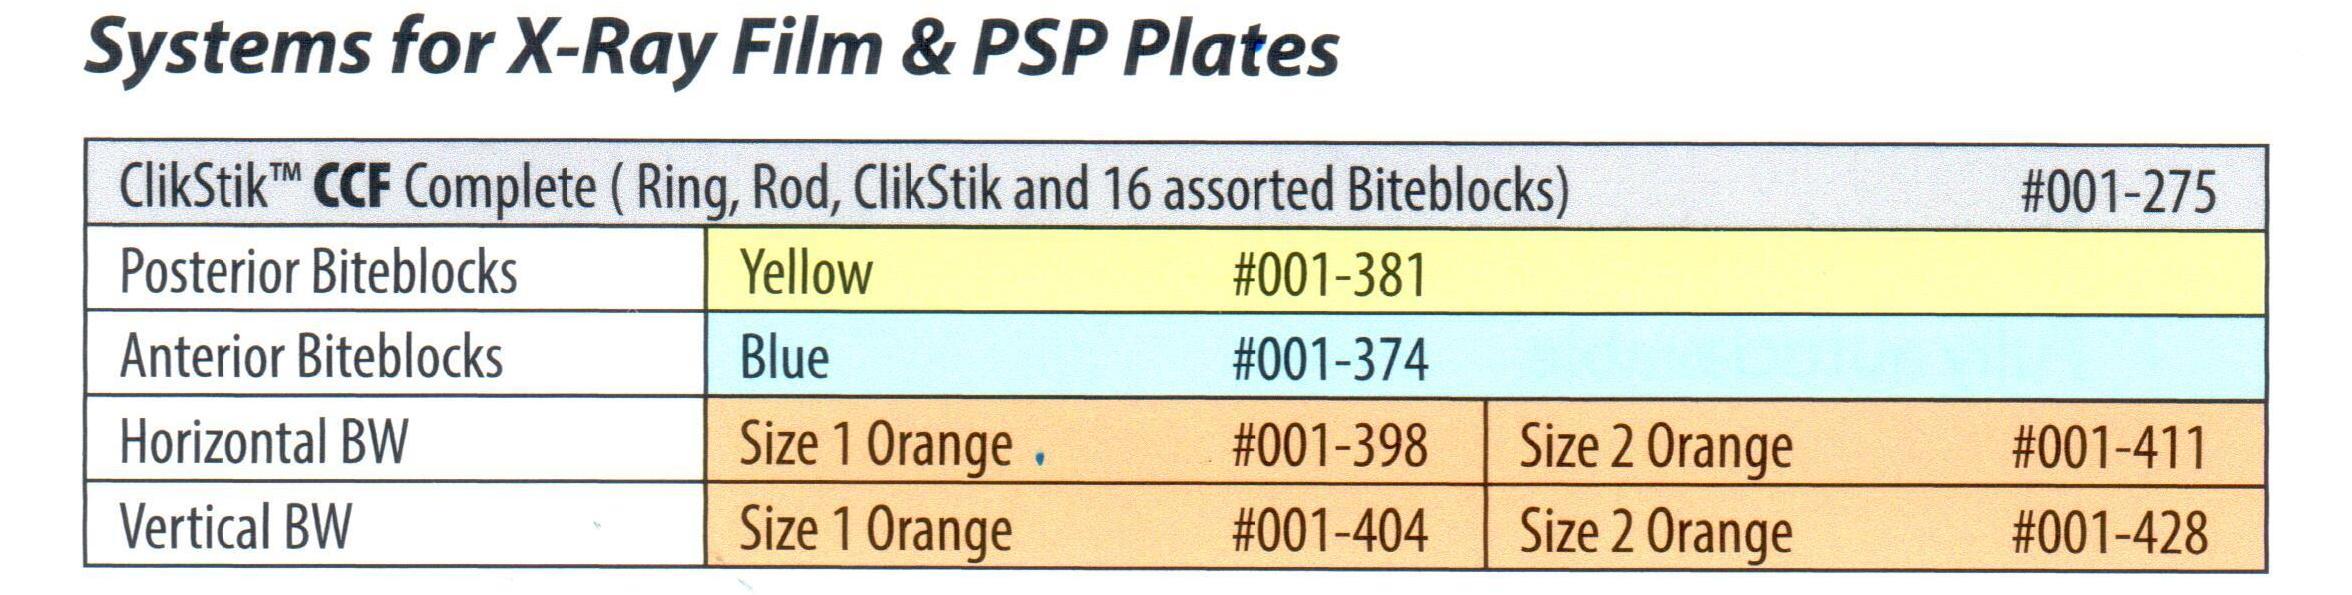 X-Ray Film & PSP Biteblocks and system.jpg